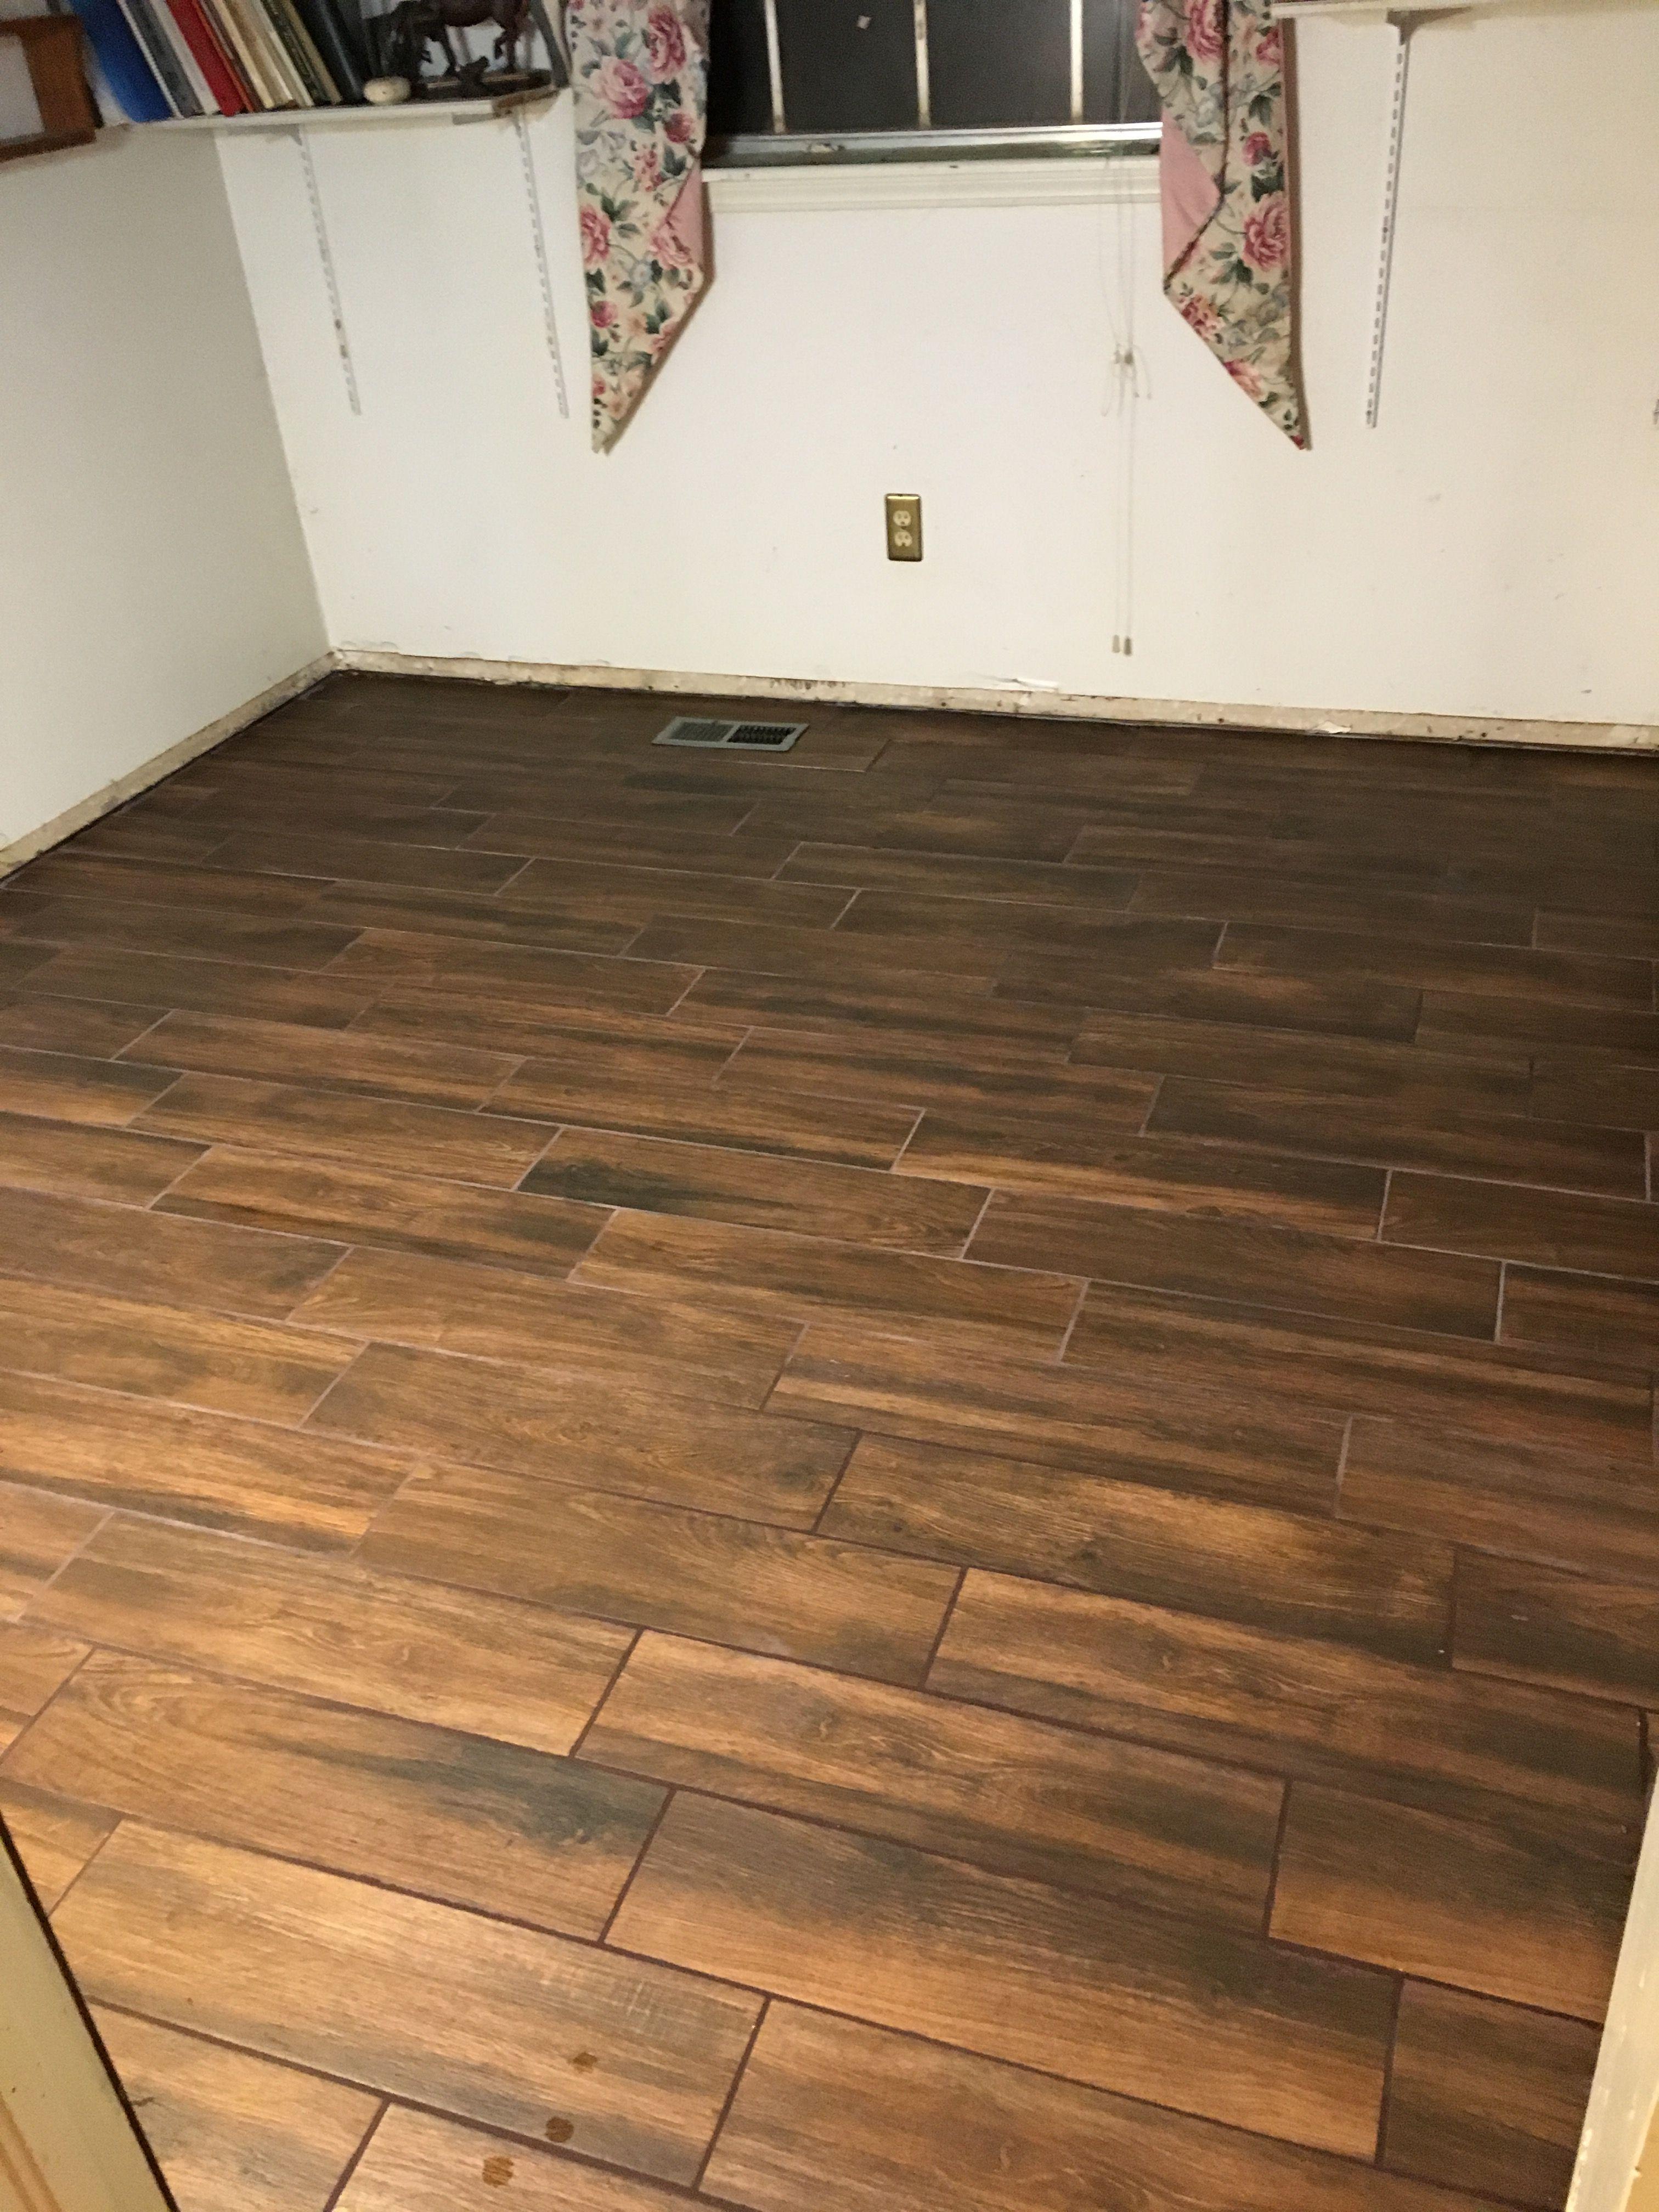 Wood Floor Tile Floors